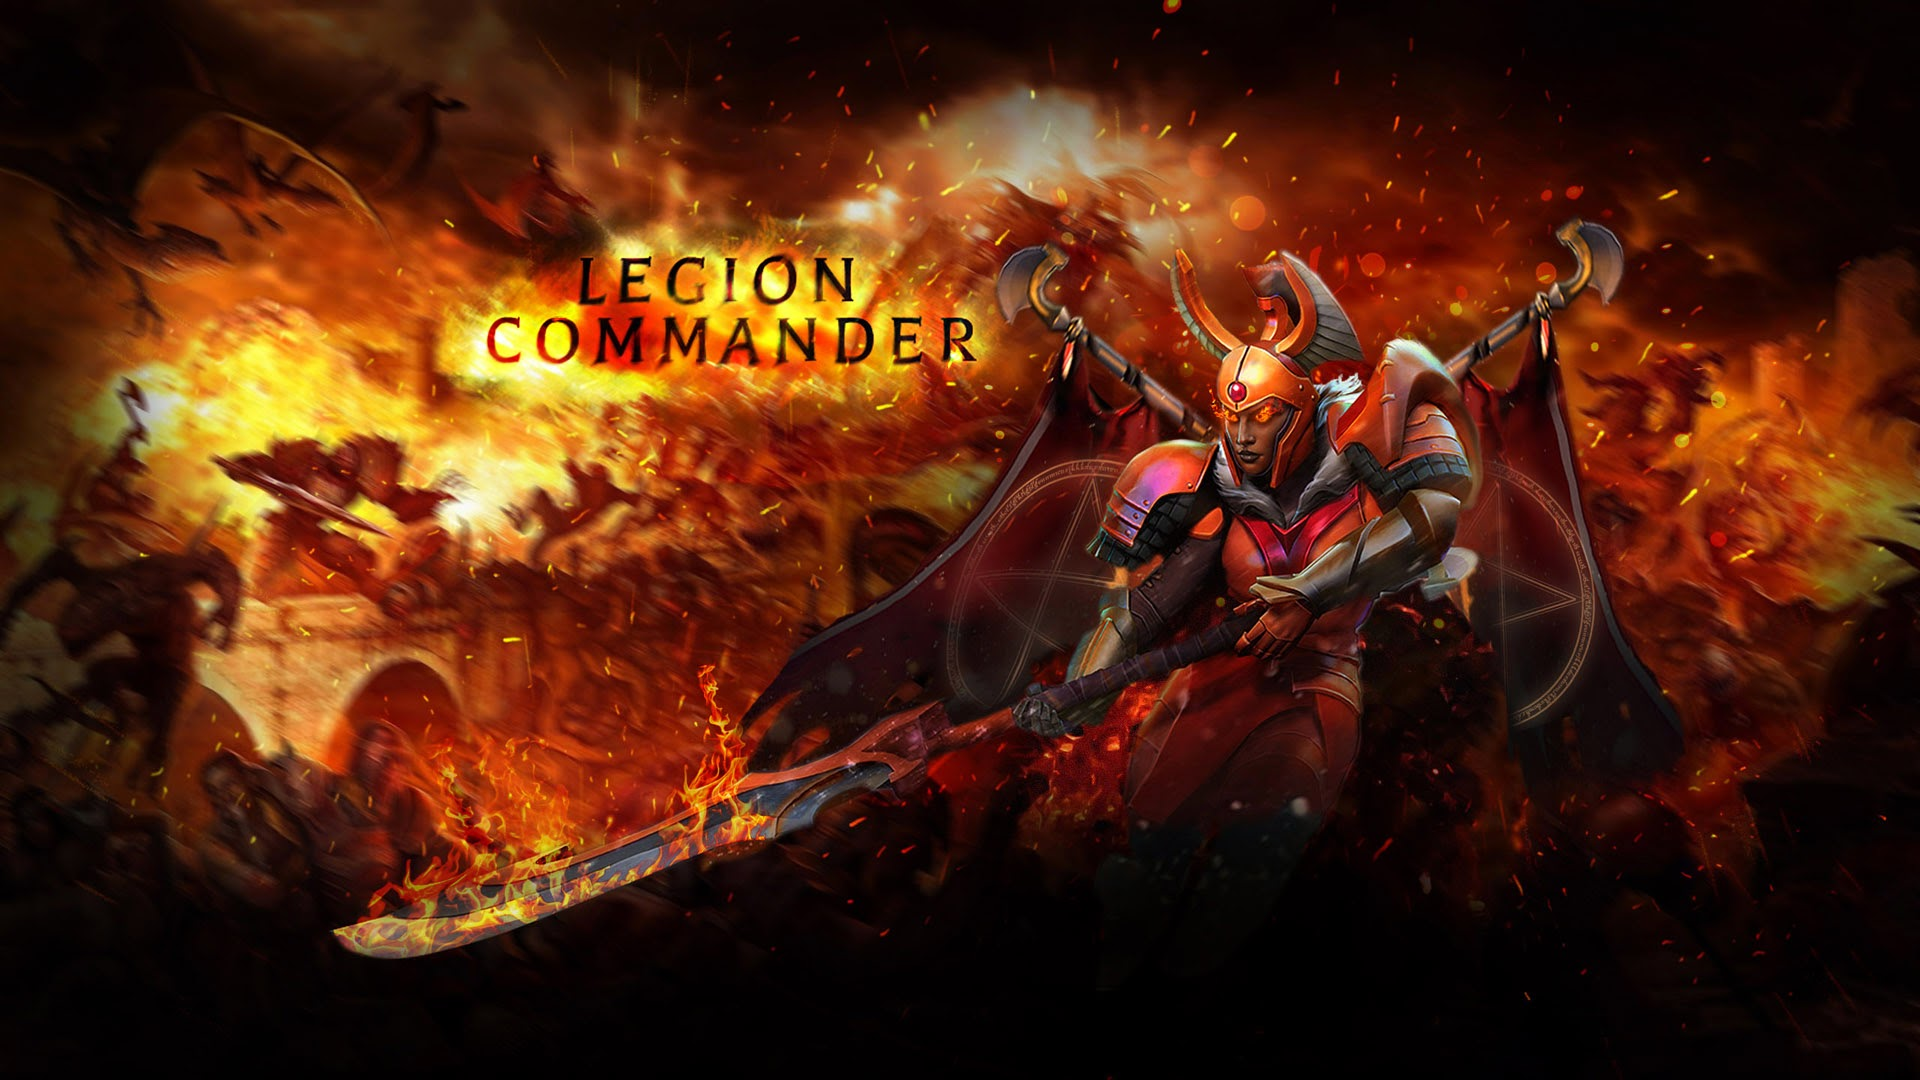 Legion Commander Dota 2 7c Wallpaper HD